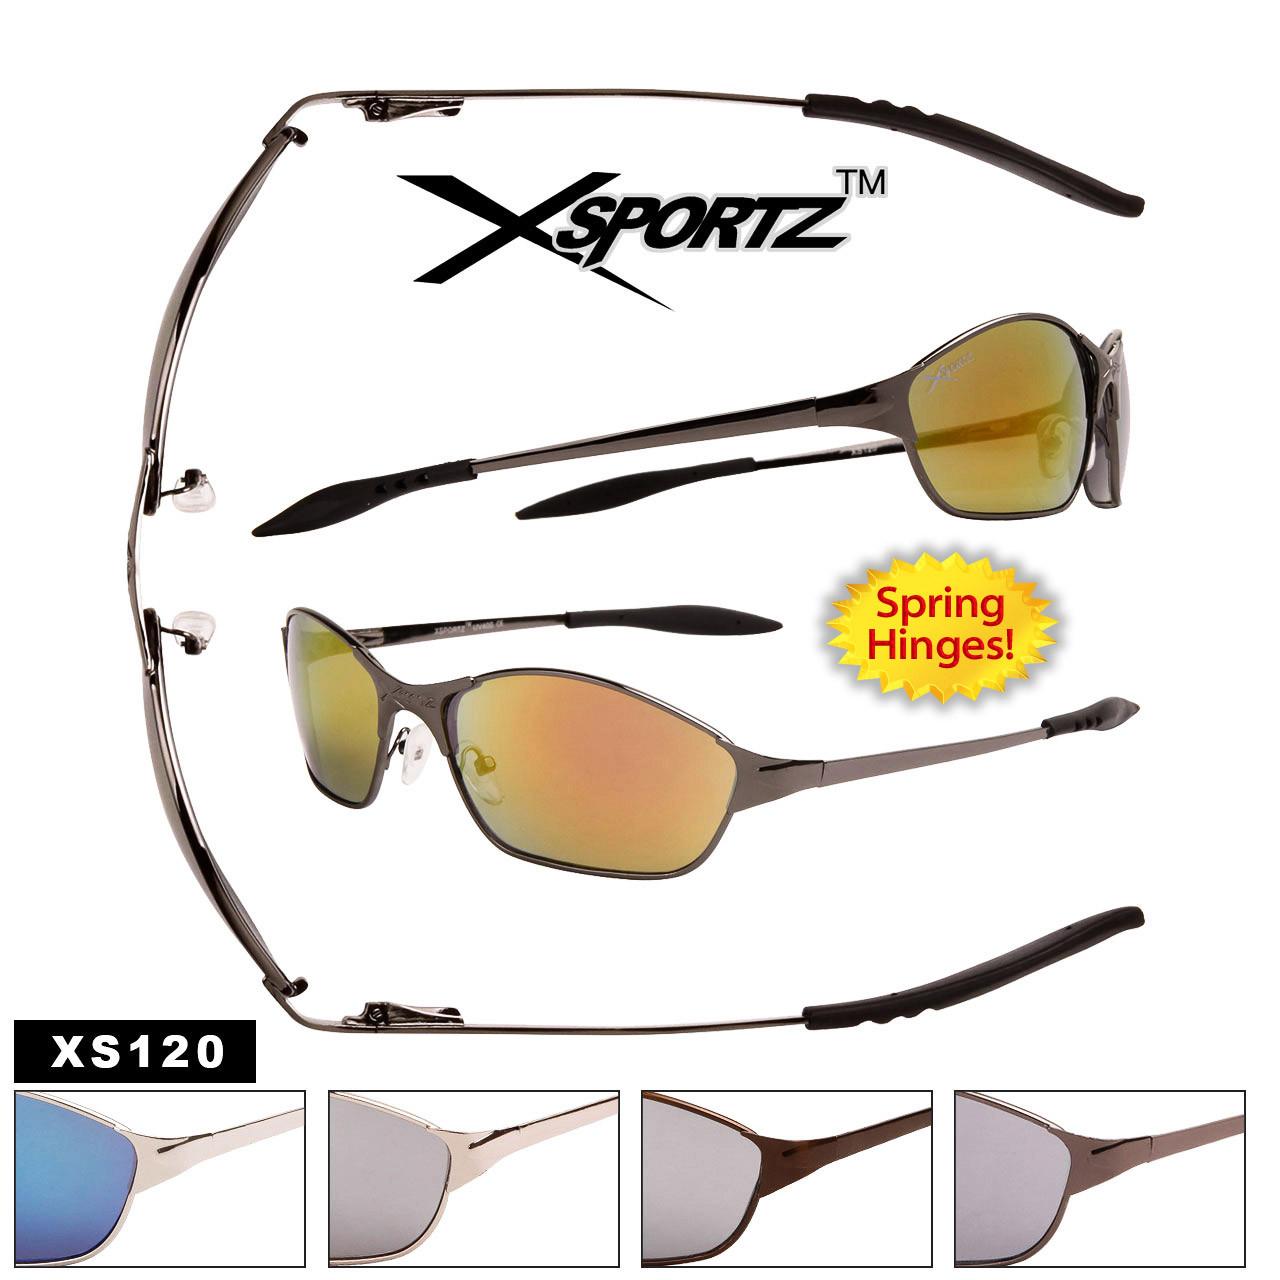 Men's Sport Sunglasses Wholesale - Style #XS120 Spring Hinge